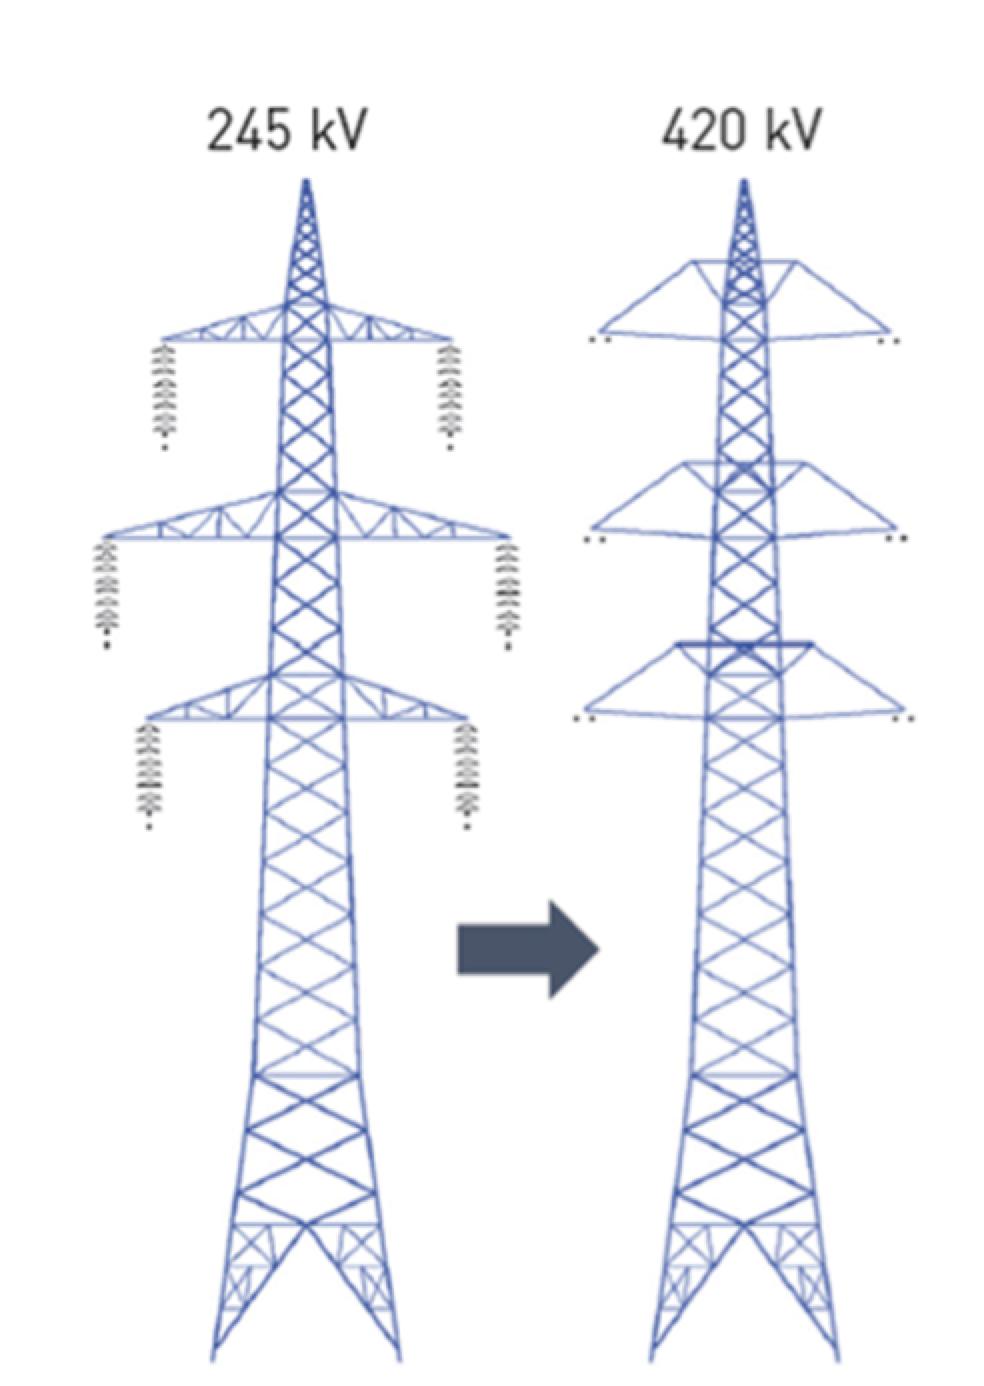 composite insulator Line Uprating with Composite Insulators Uprating 245 kV to 420 kV using composite insulating cross arms